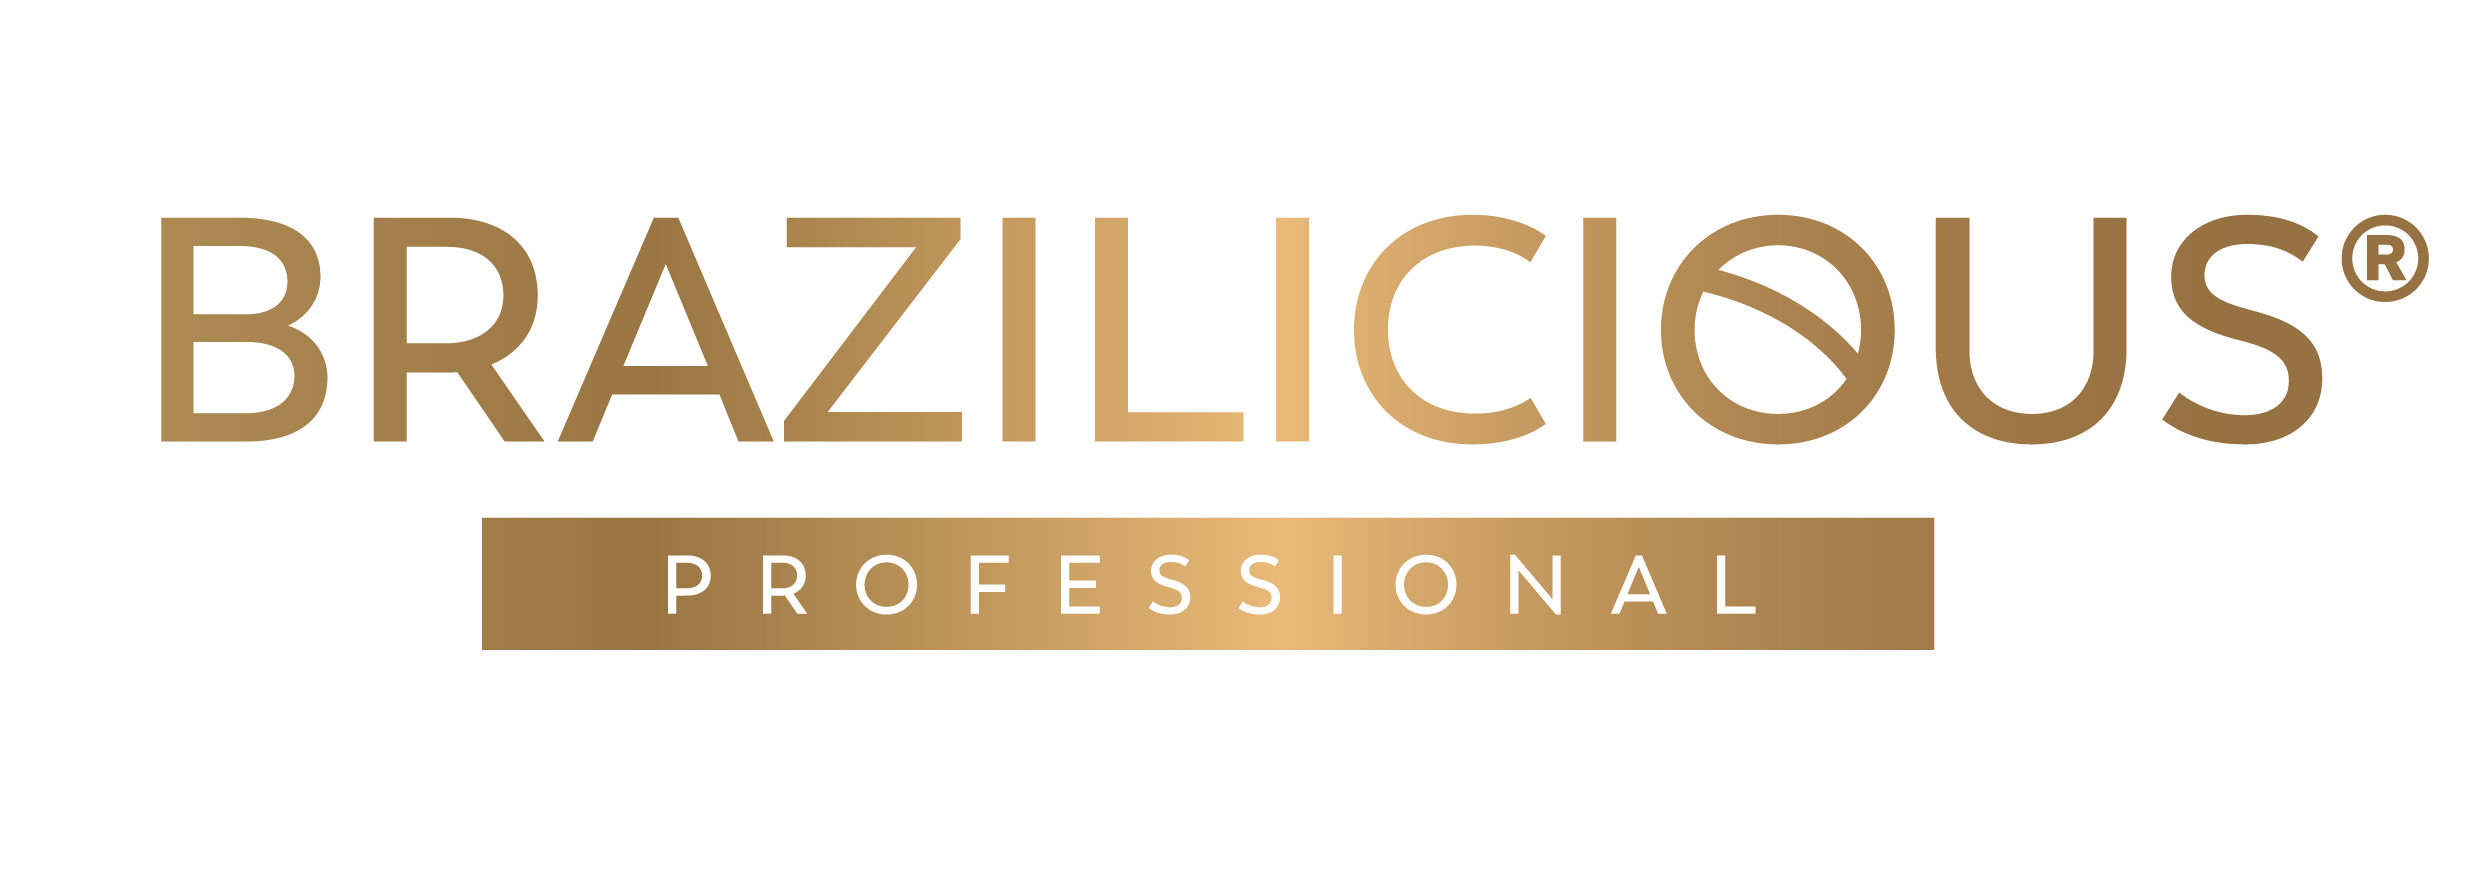 Brazilicious Professional